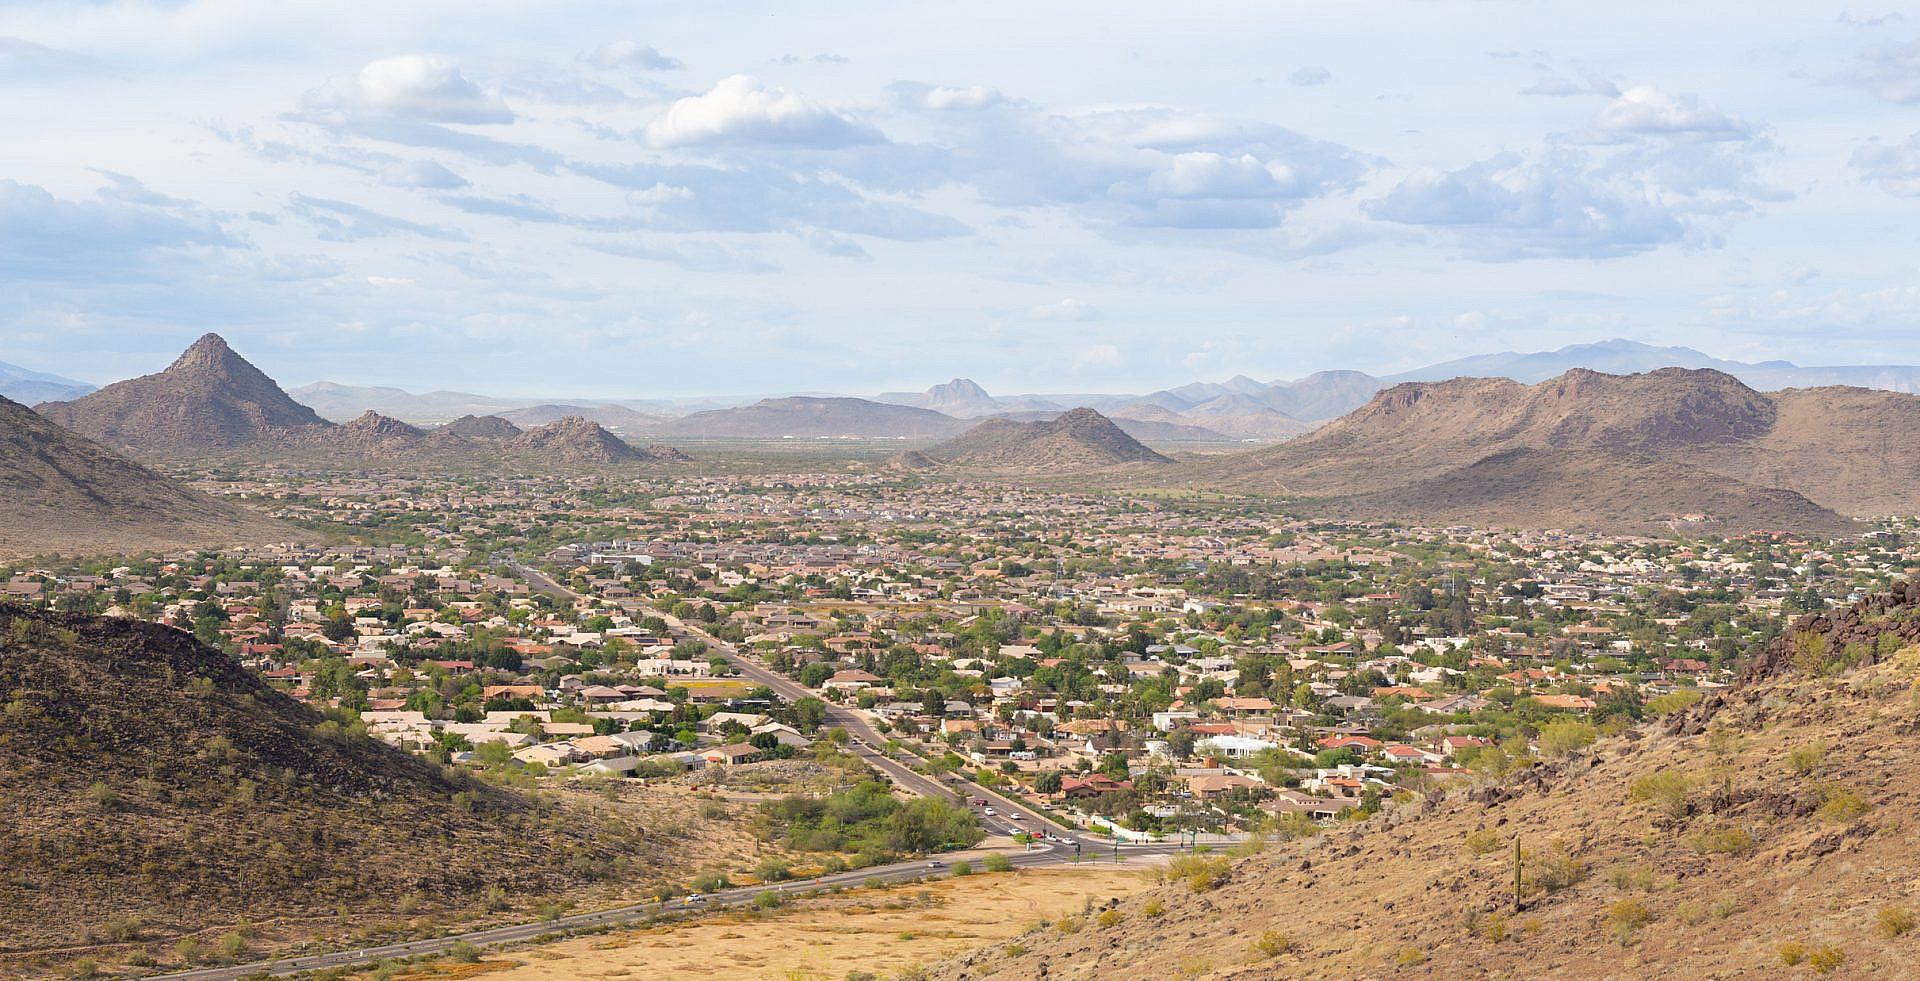 Far-off view of Glendale, Arizona